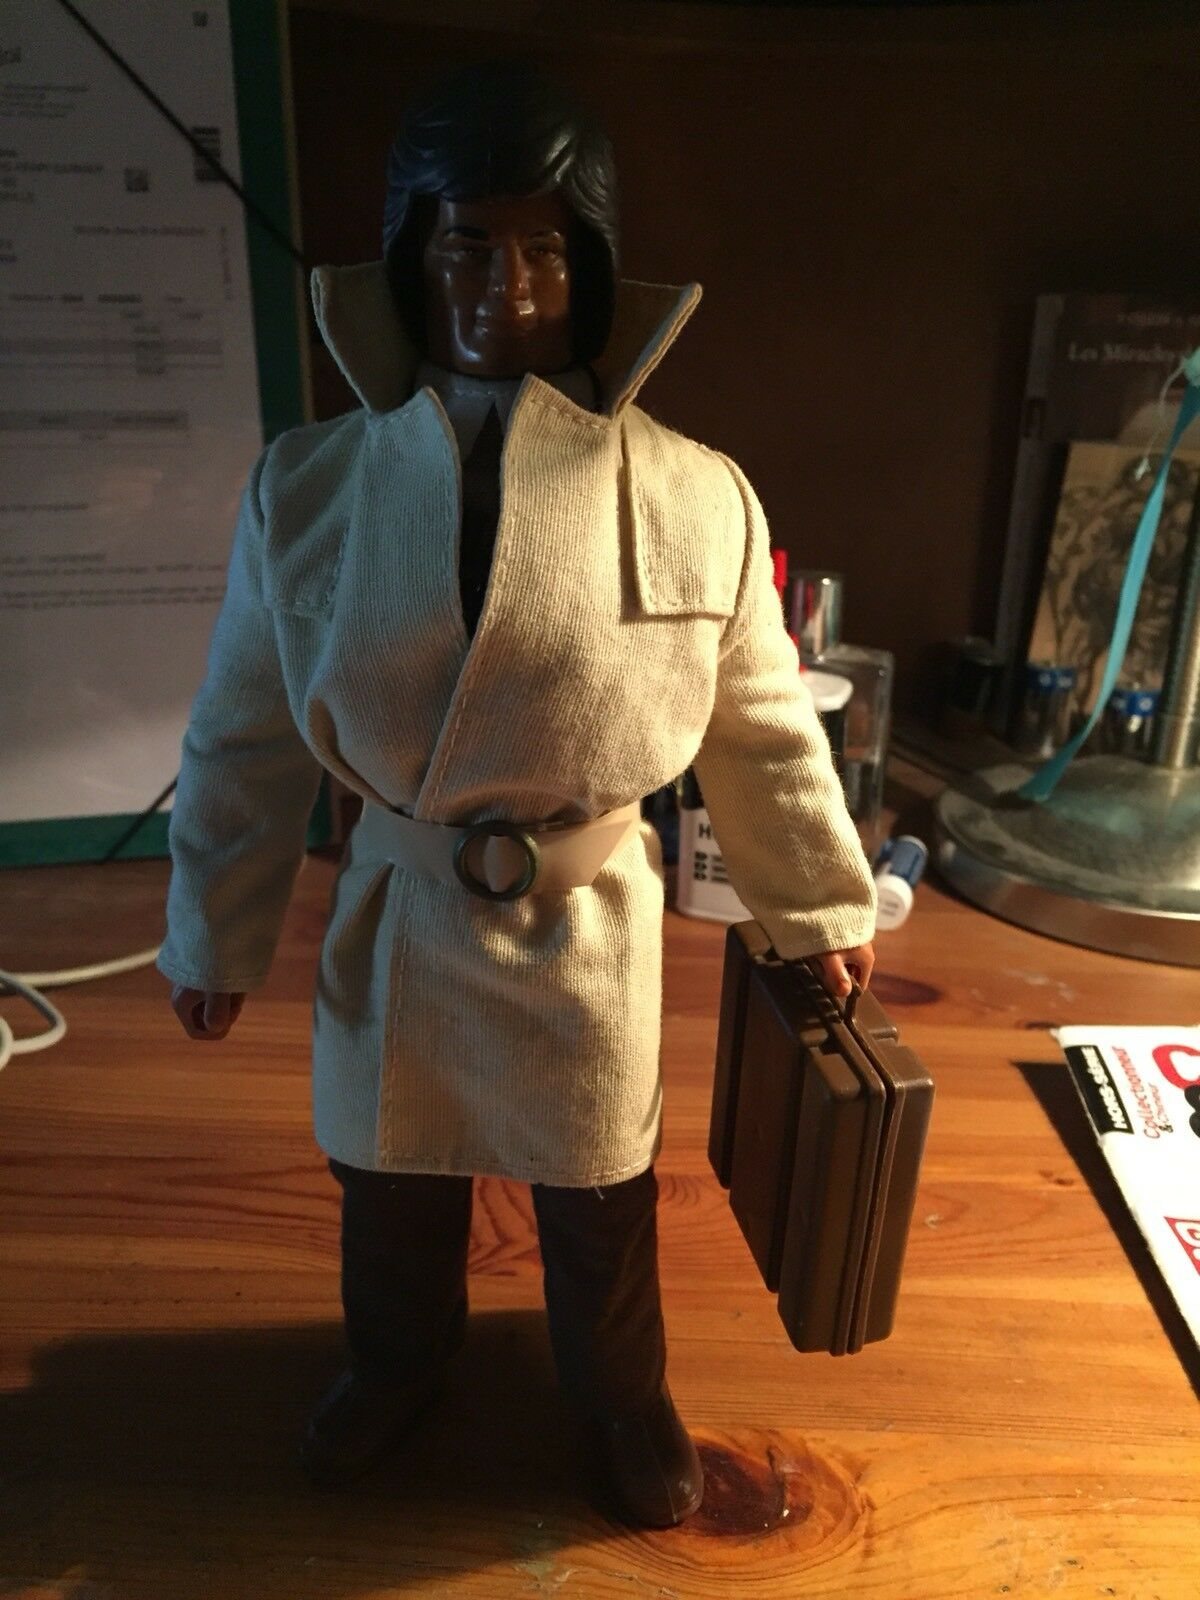 Big jim agent geheimnis 004